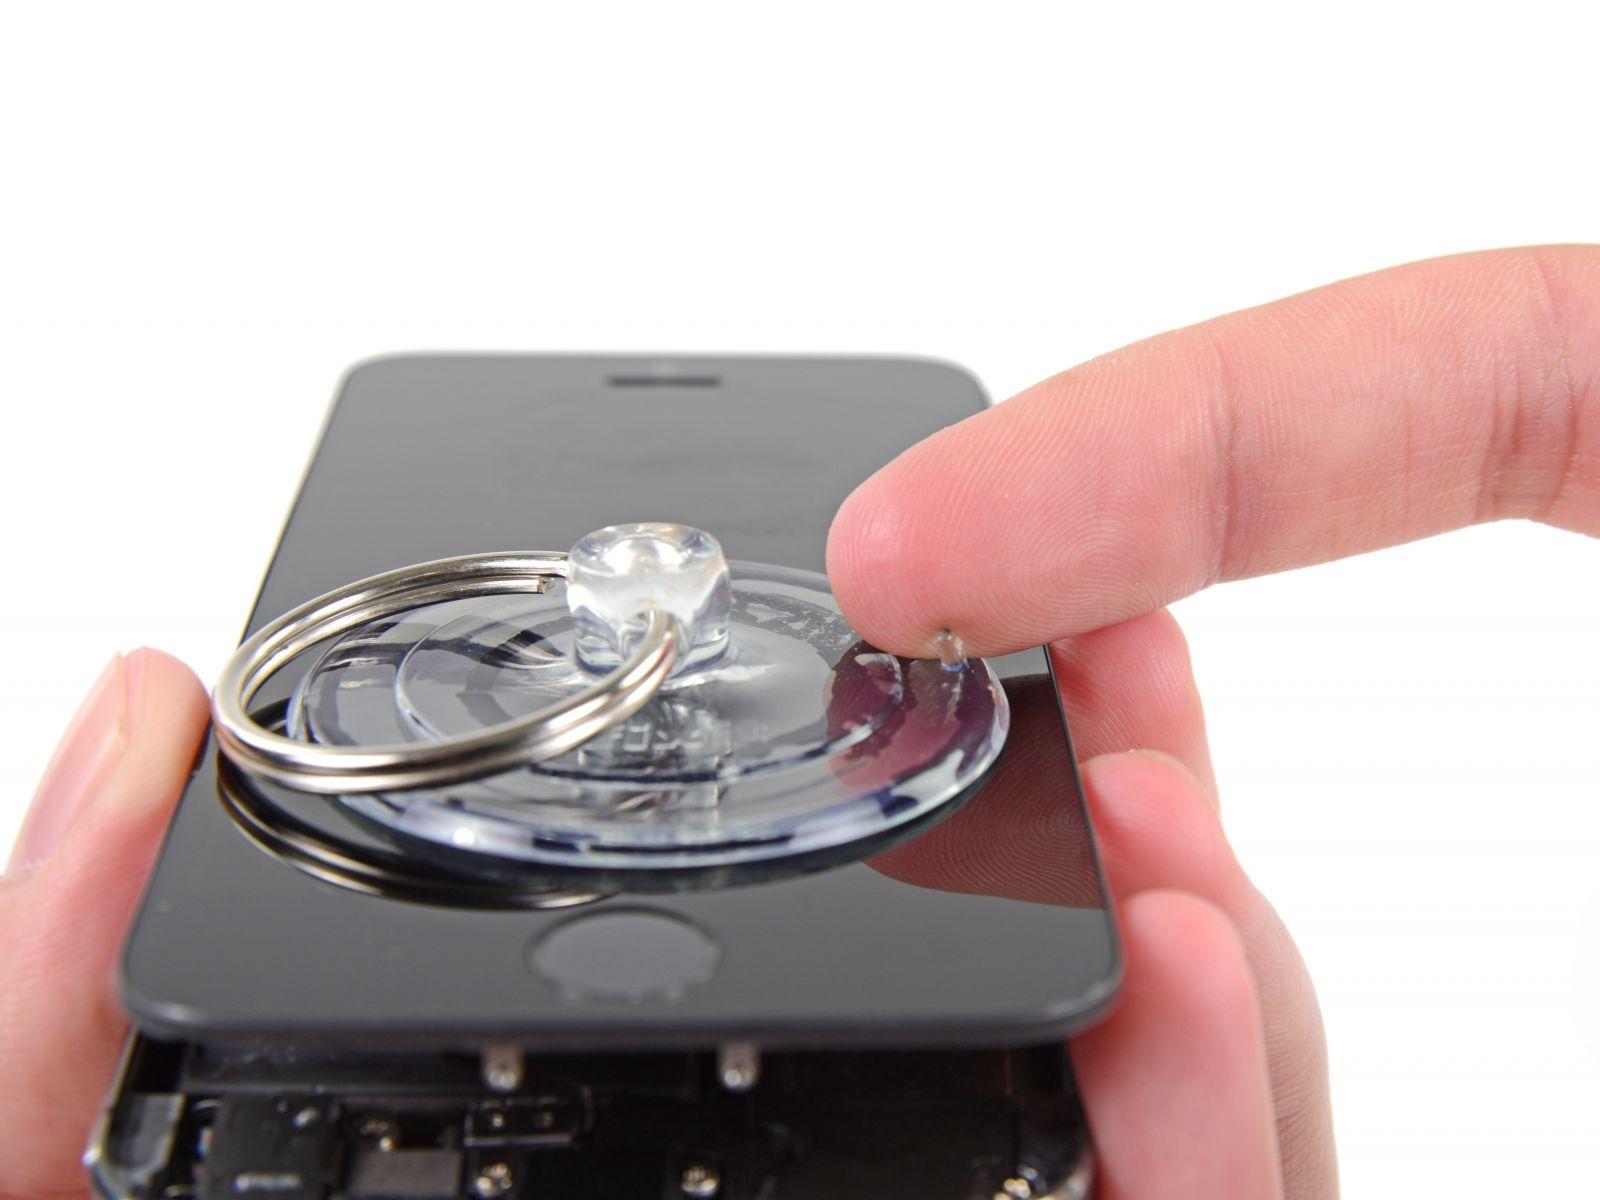 Замета аккумулятора на iPhone 5S (8)